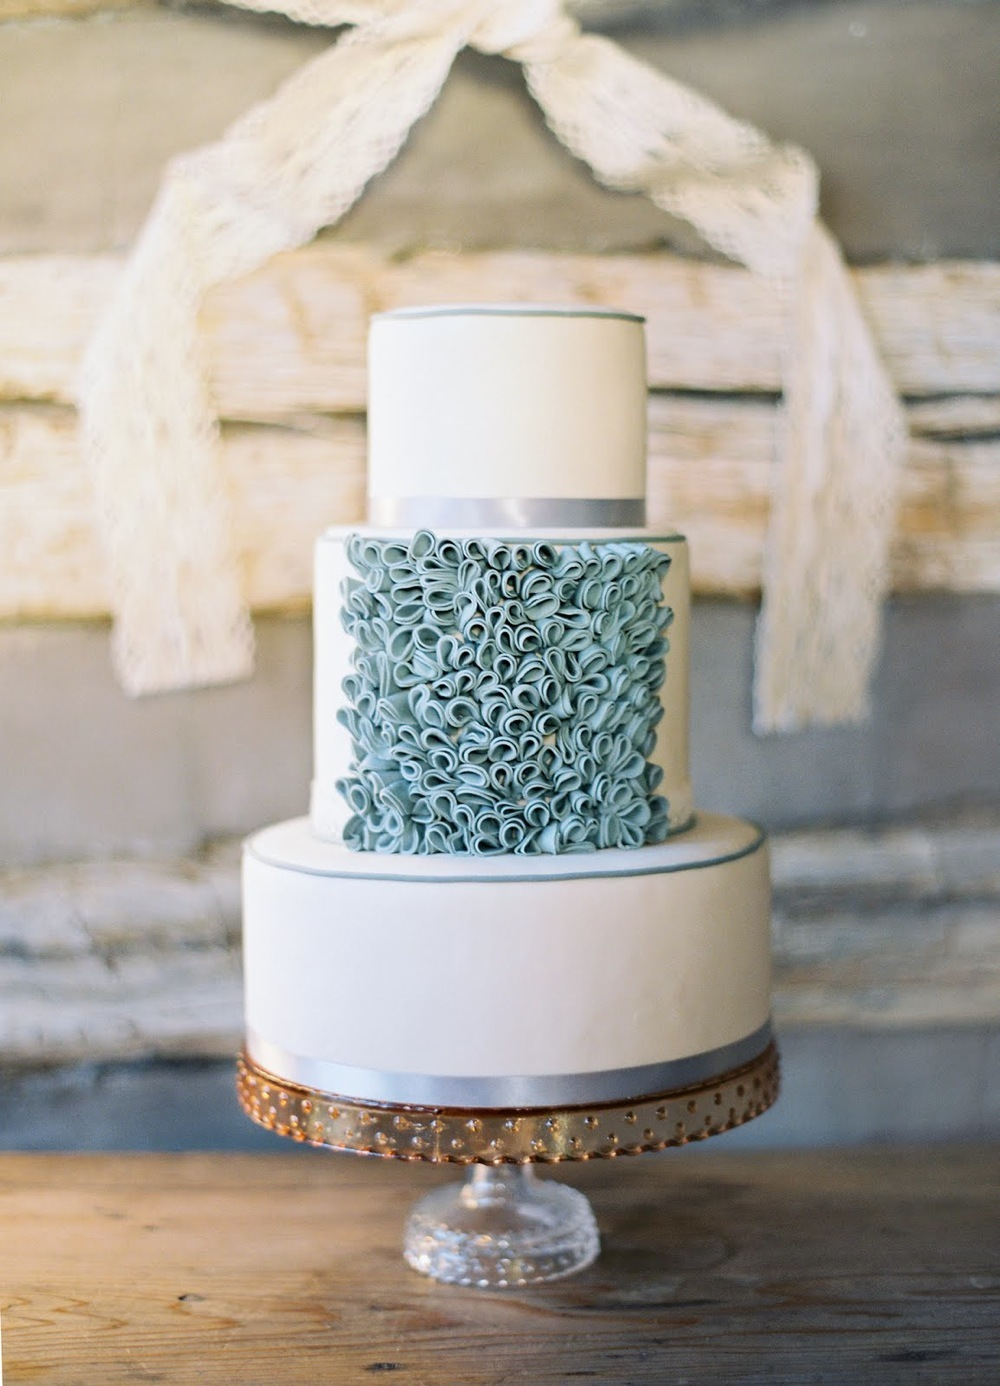 Whimsical-wedding-cakes-textured-something-blue.full